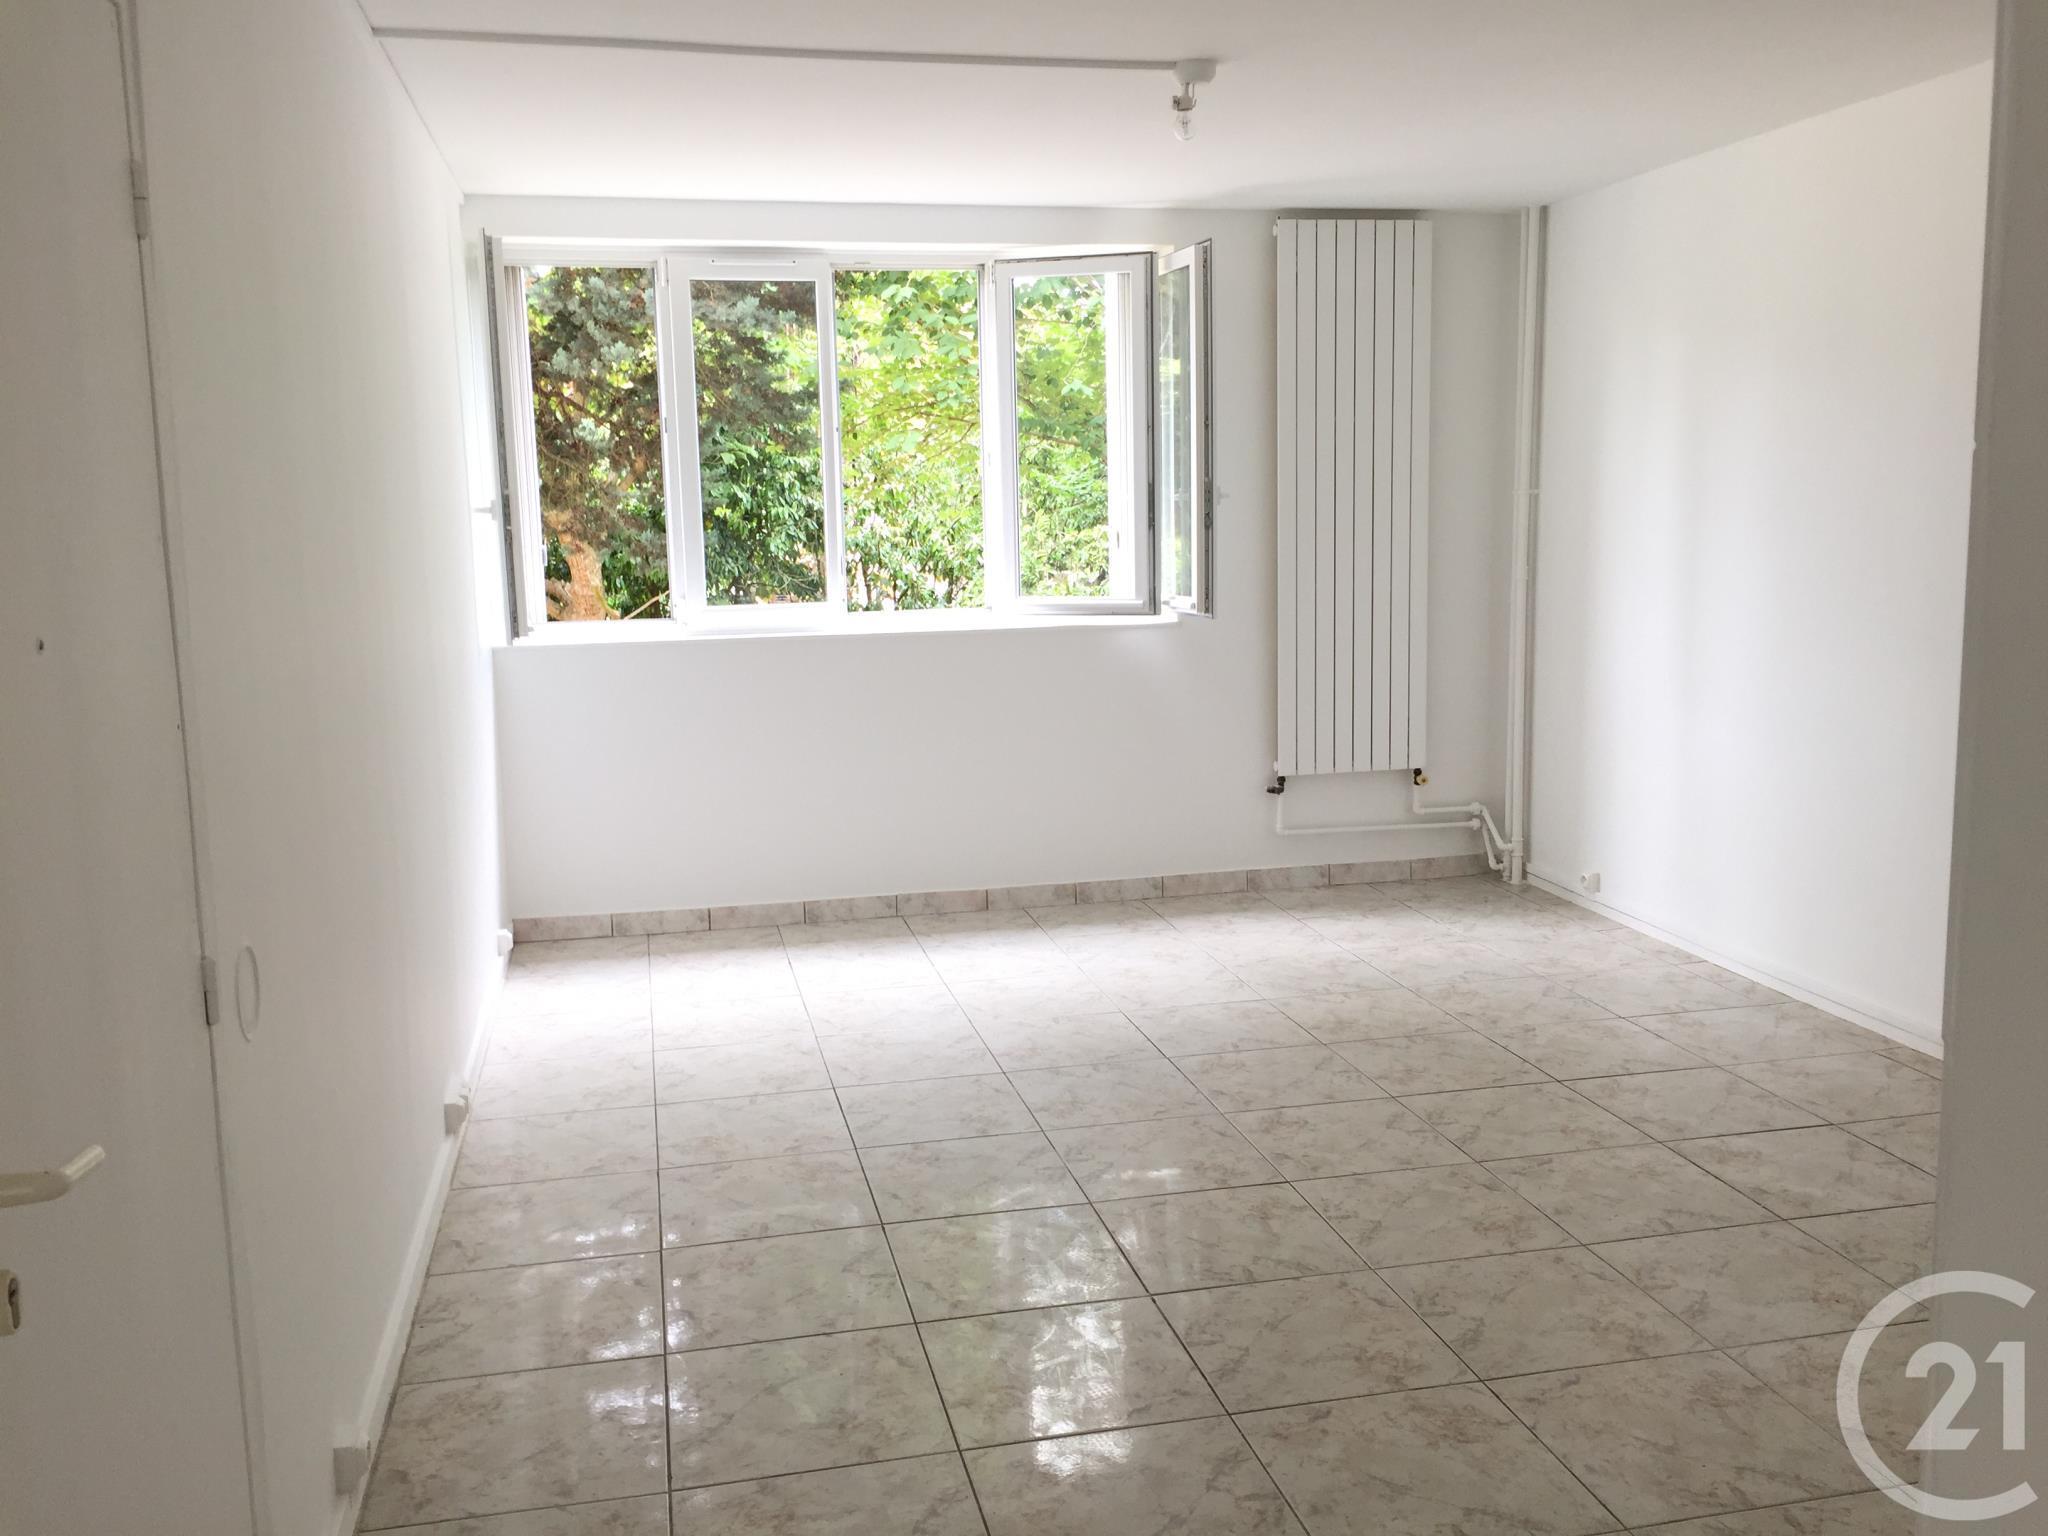 appartement f2 vendre 2 pi ces 41 m2 villejuif 94 ile de france. Black Bedroom Furniture Sets. Home Design Ideas